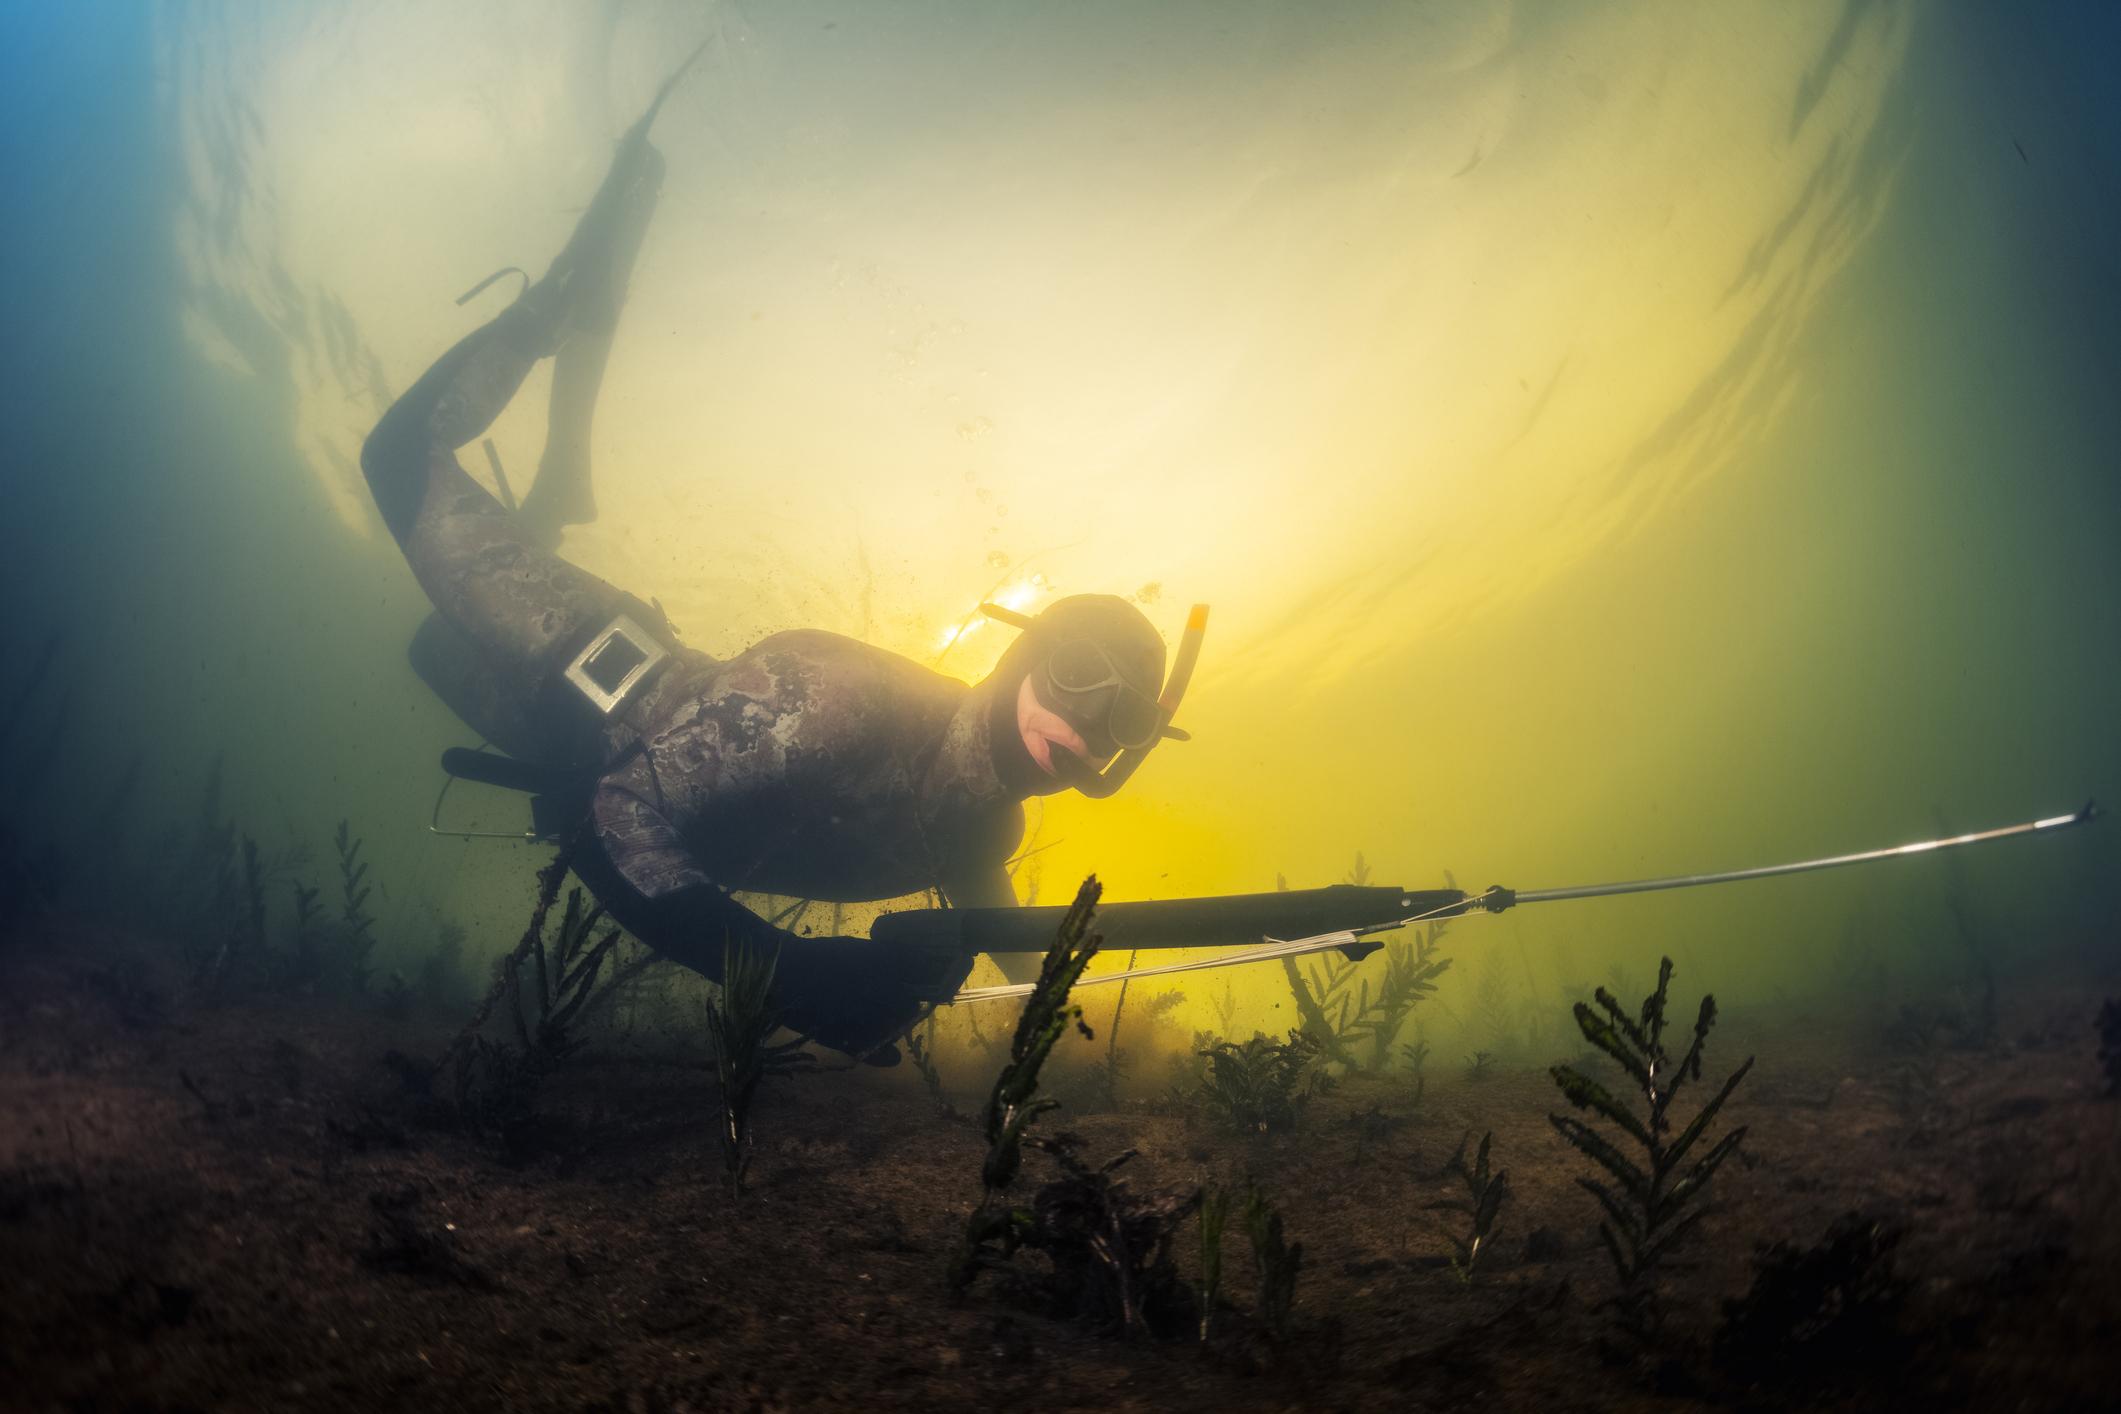 Scuba diver spear fishing